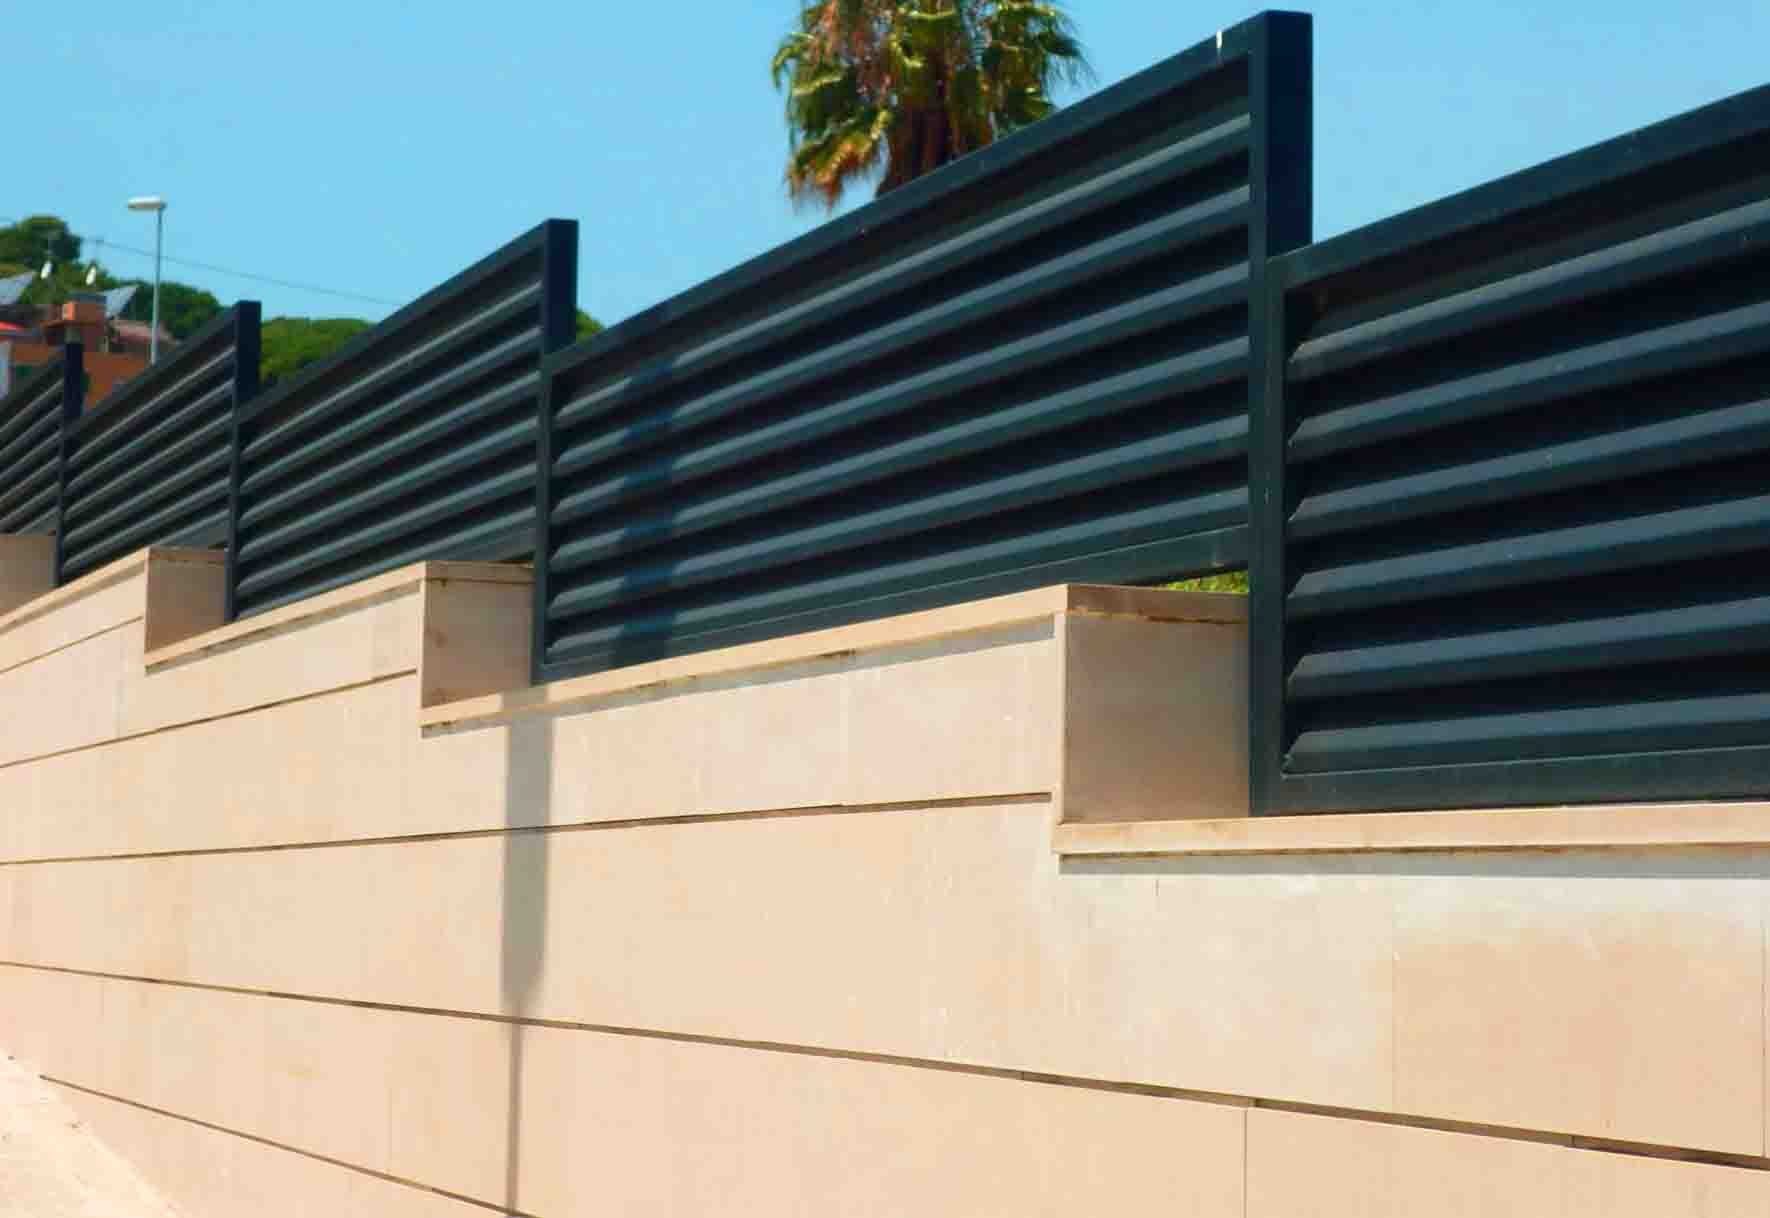 Cerramientos met licos en gipuzkoa ibarkalde s l for Muro de separacion terraza